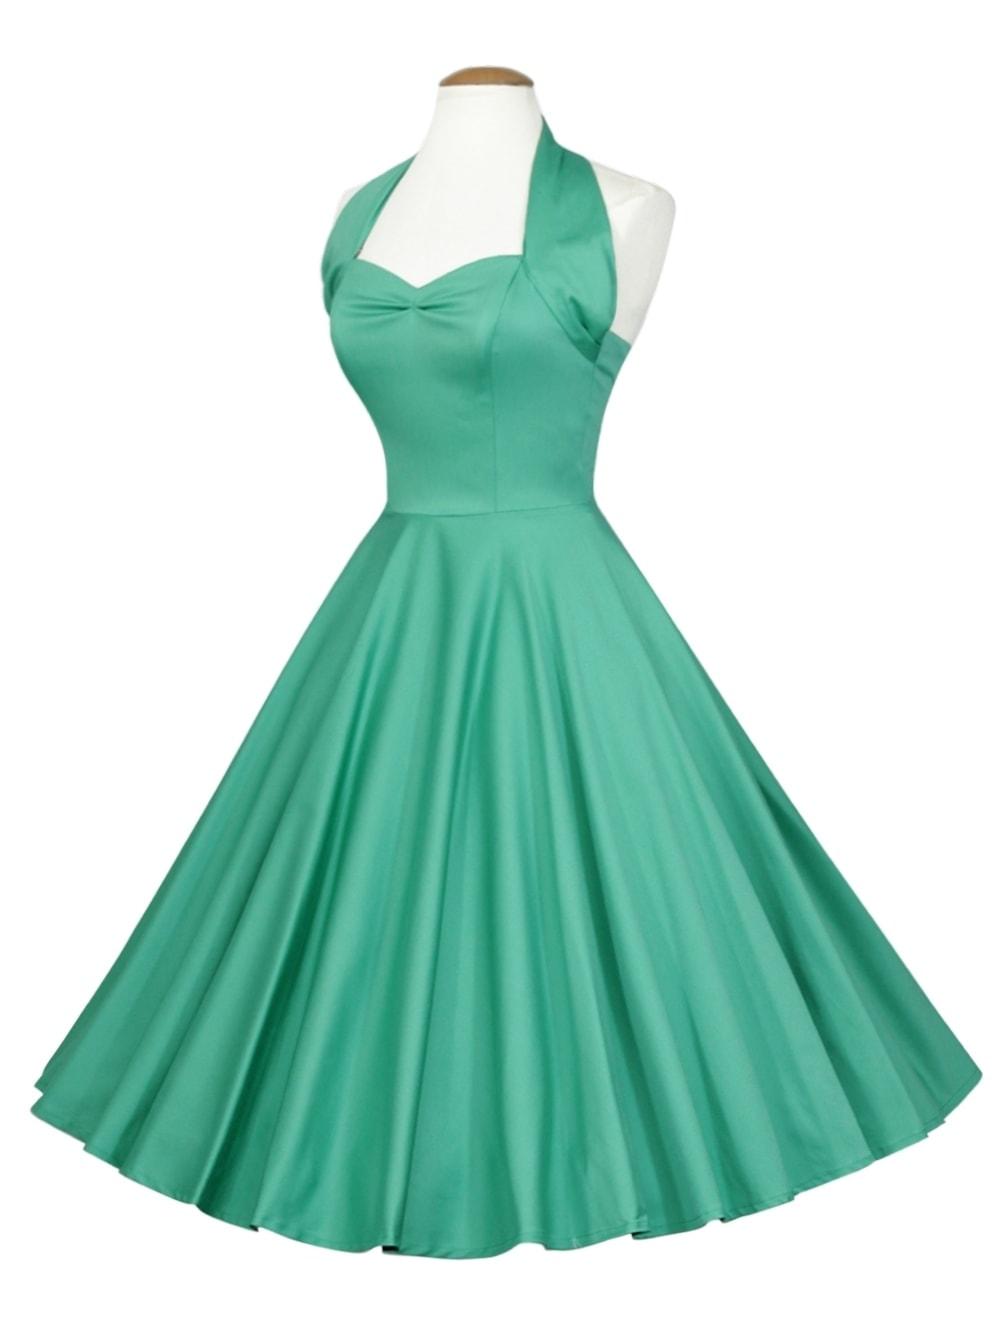 1950s Halterneck Jade Sateen Dress from Vivien of Holloway